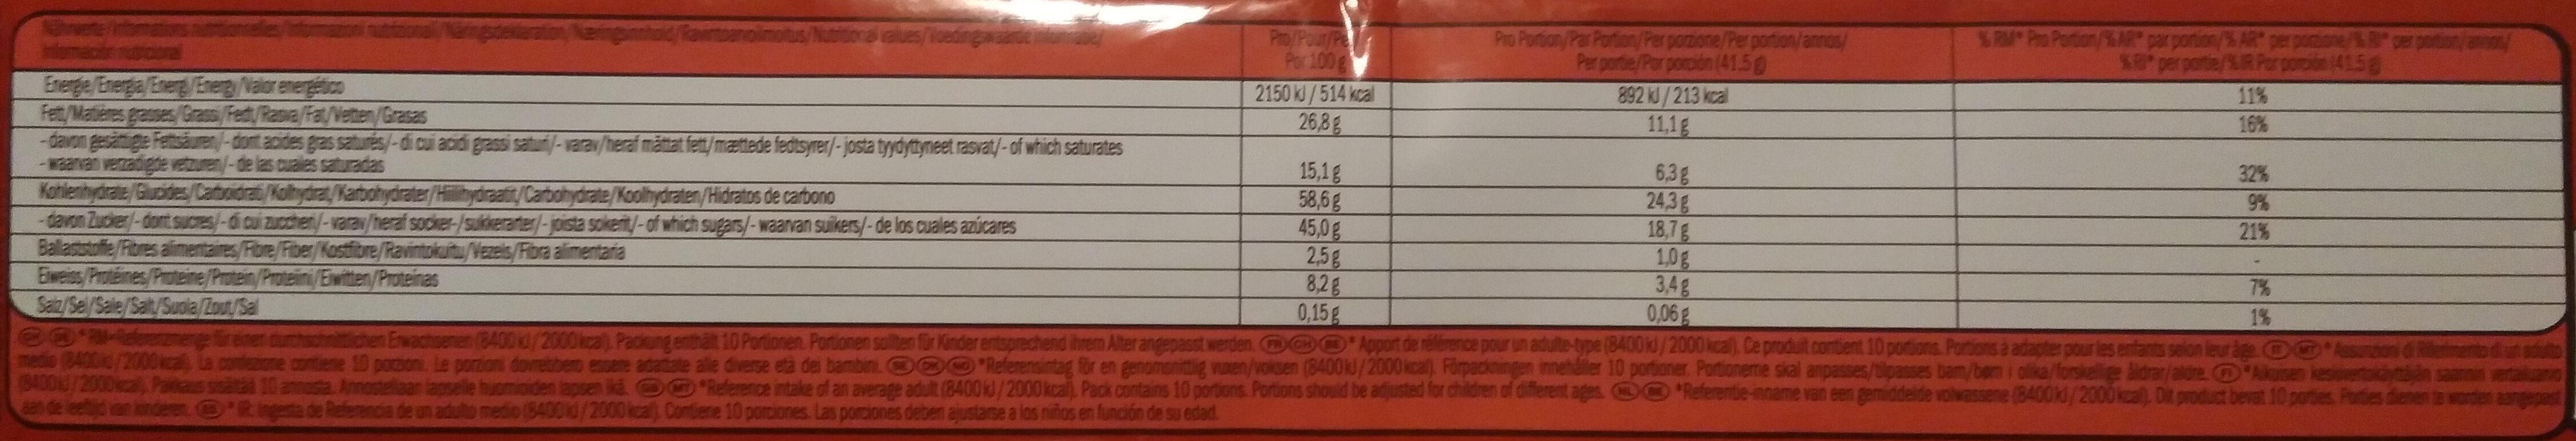 Kit Kat - Información nutricional - en